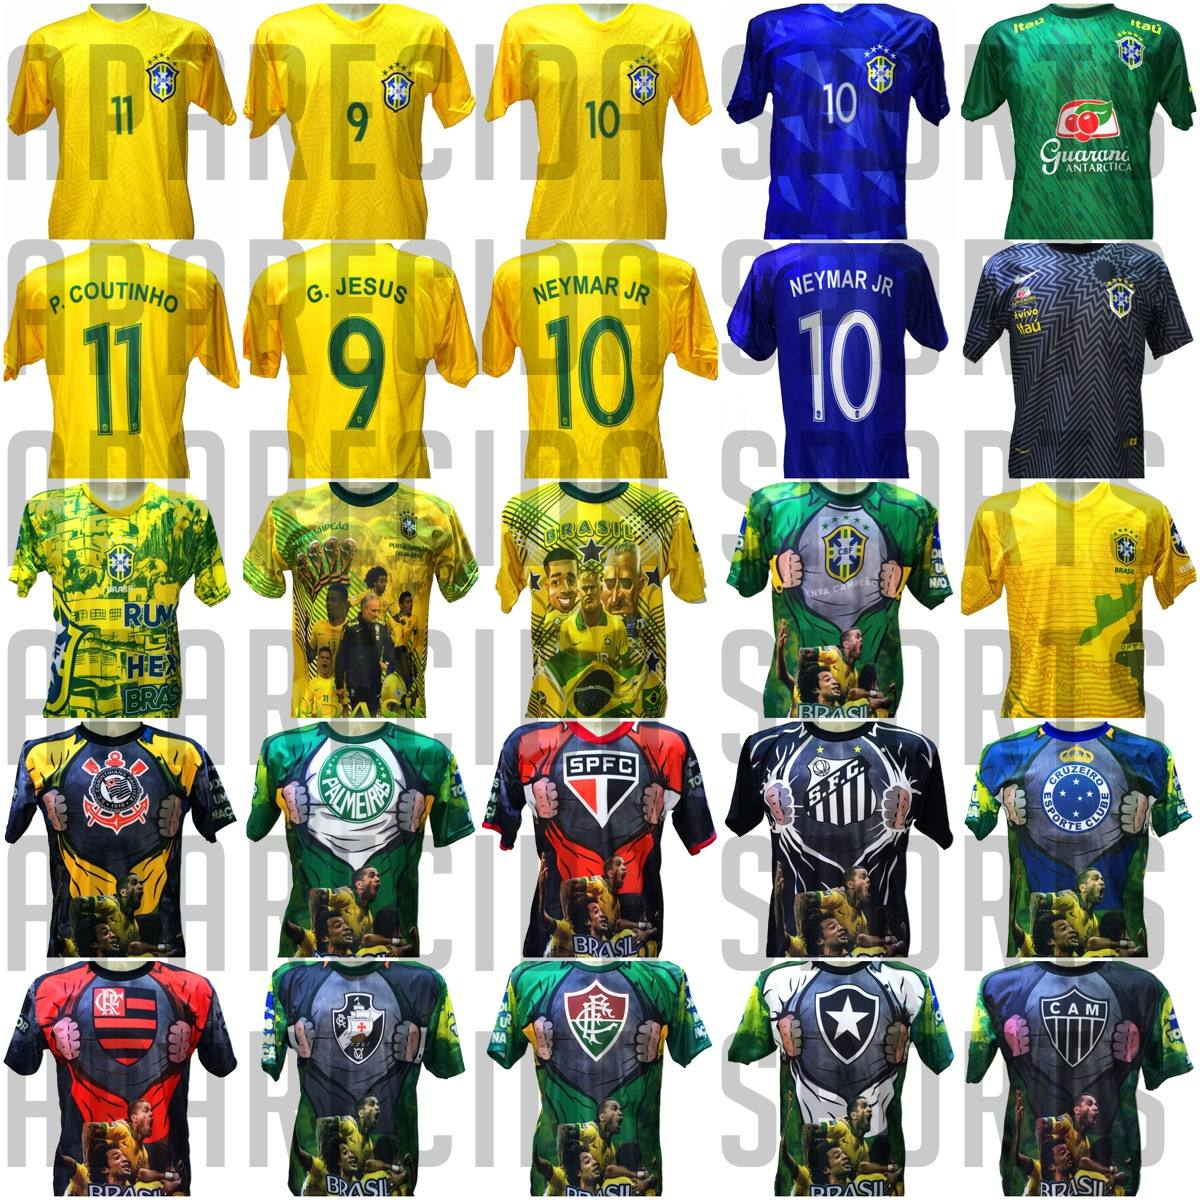 aded8228b2 camisa brasil coutinho neymar gabriel jesus - amarela. Carregando zoom.